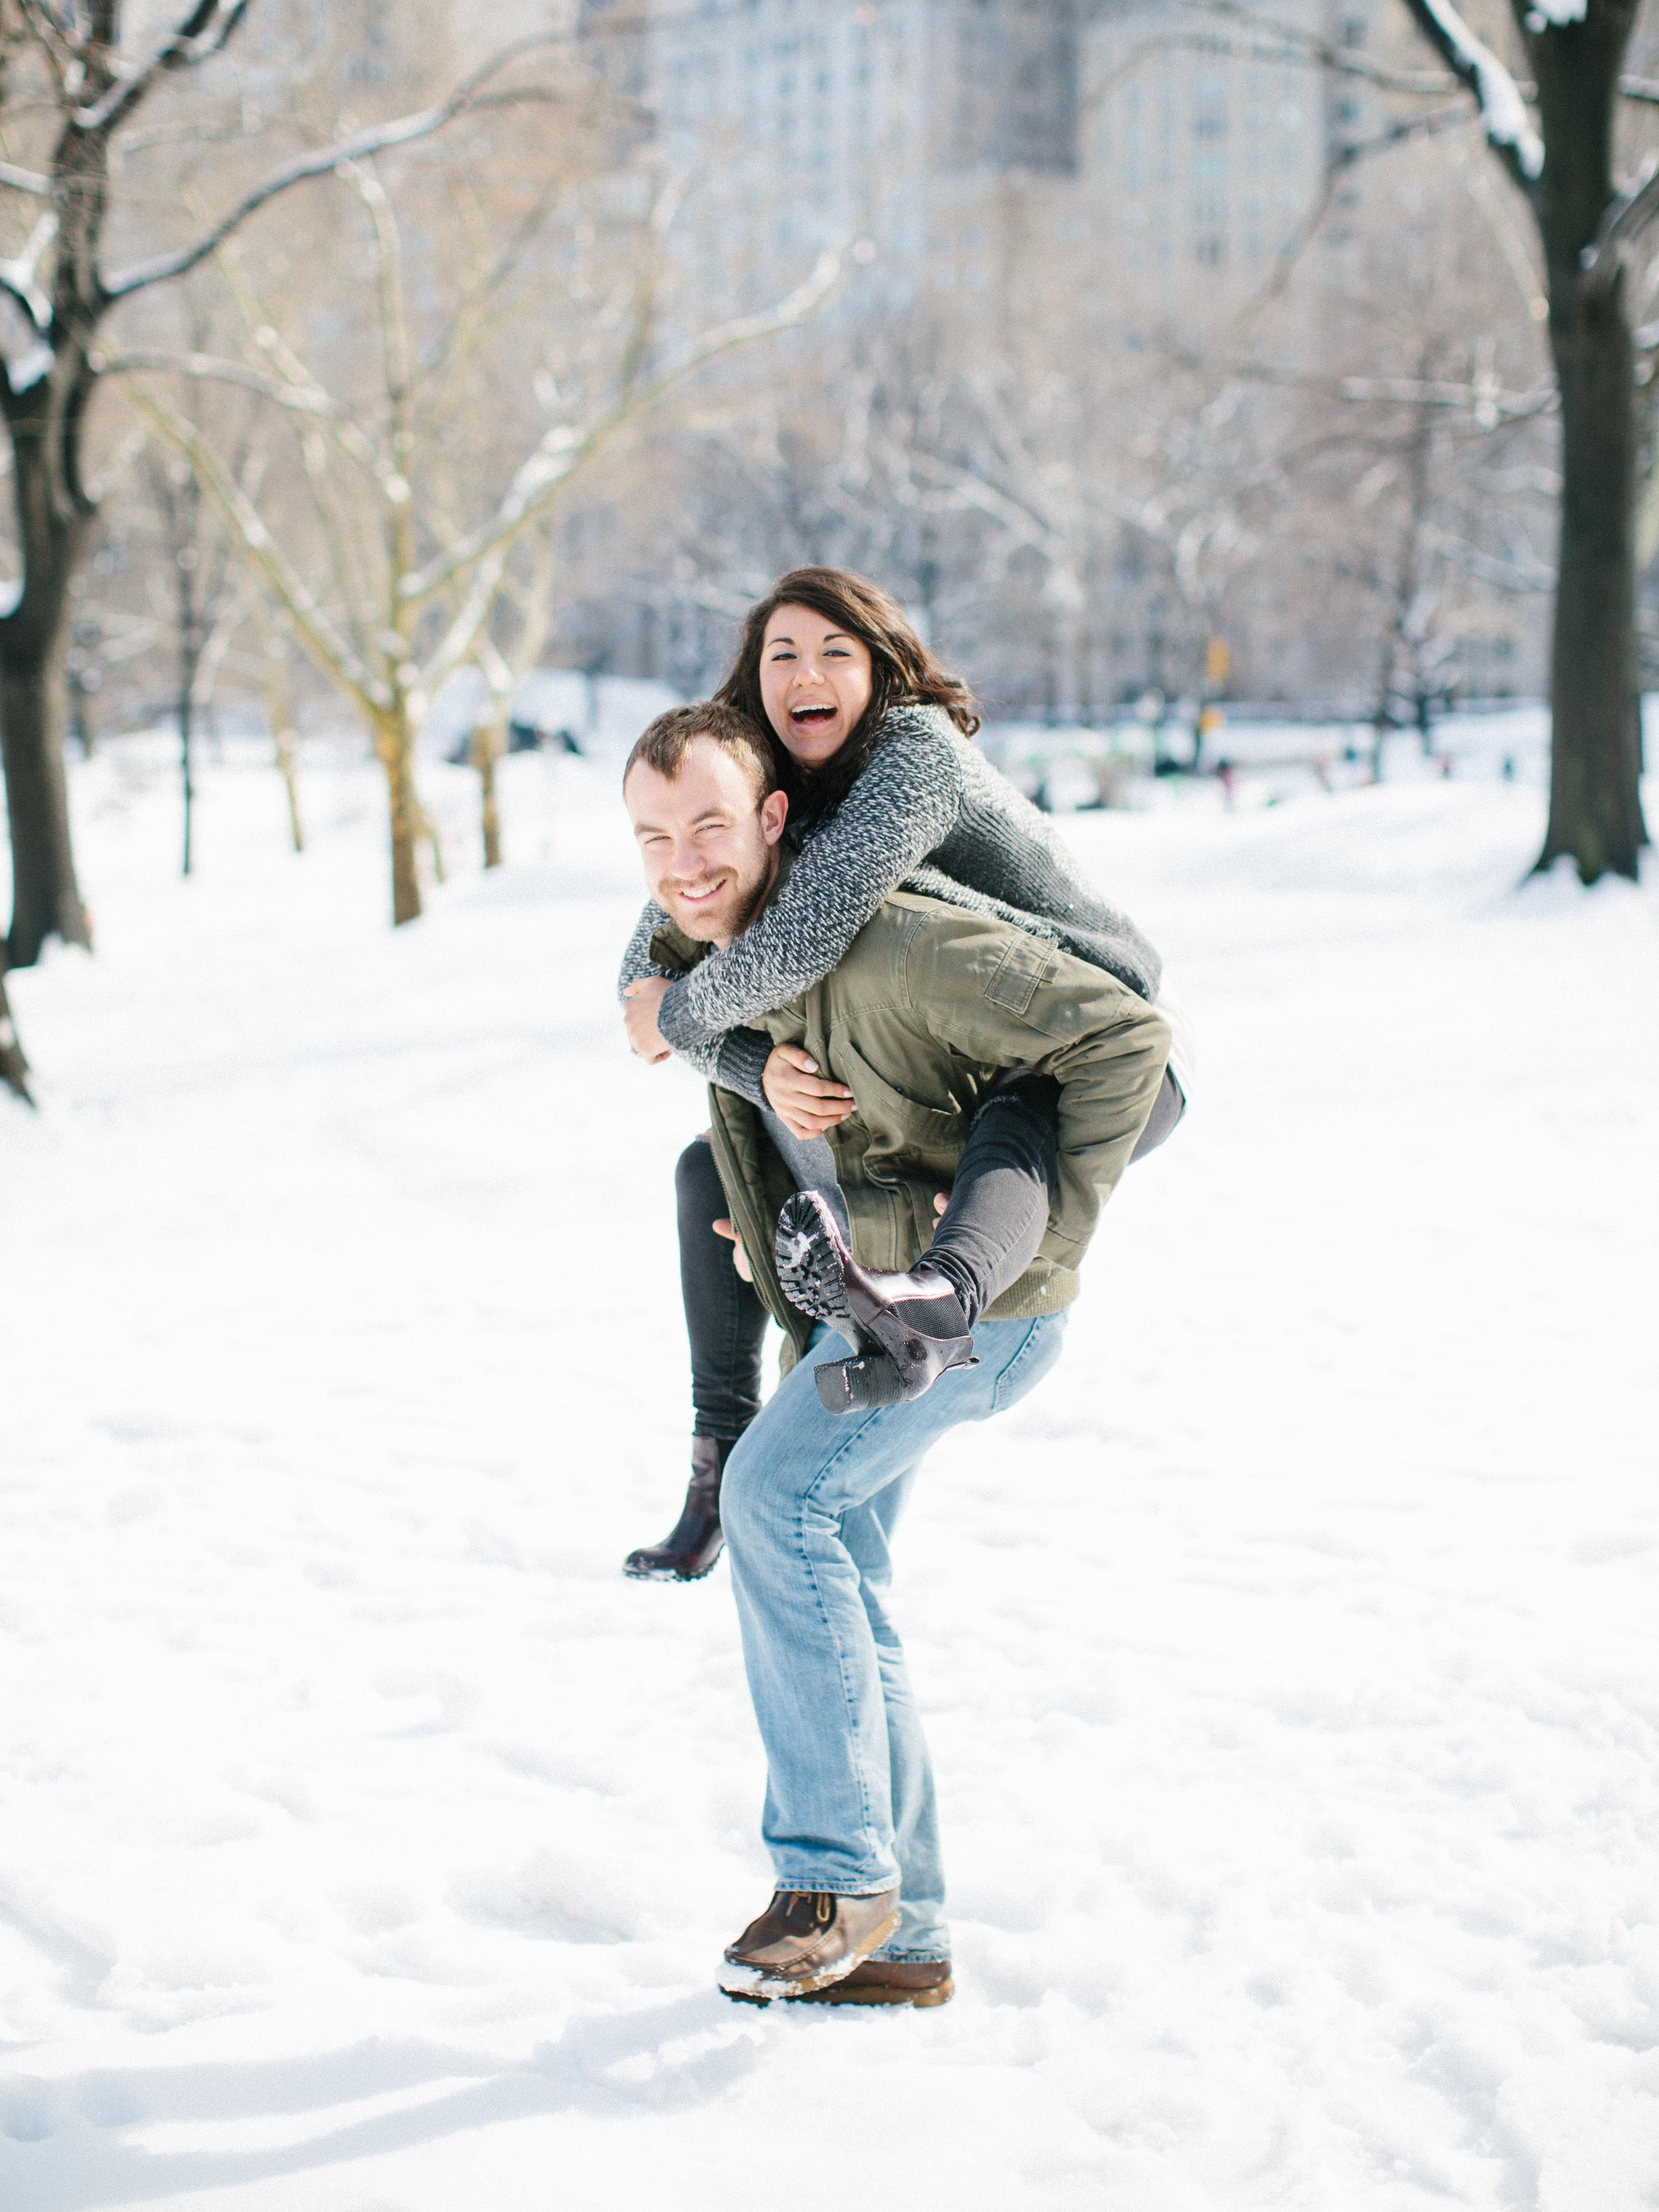 Sarah Best Photography / Meggie & Matt / NYC Central Park Engagements